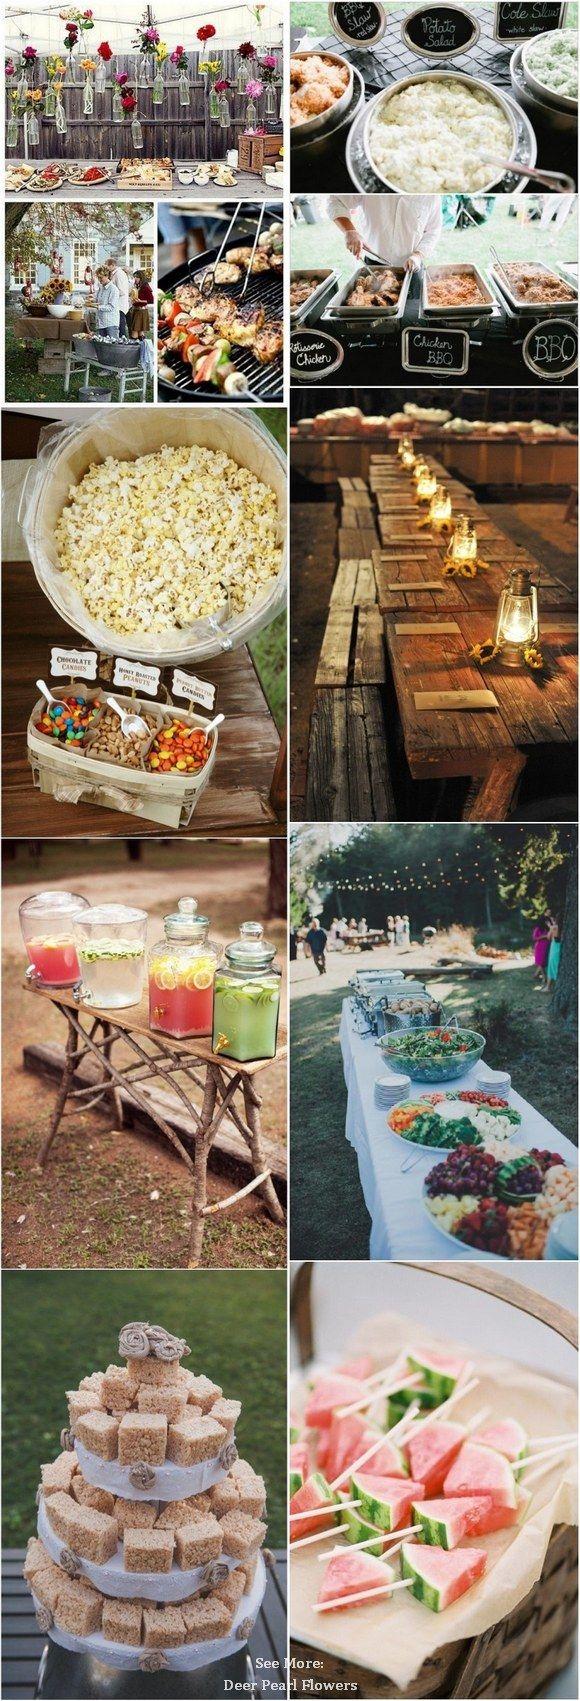 302 best wedding planning images on pinterest wedding tips